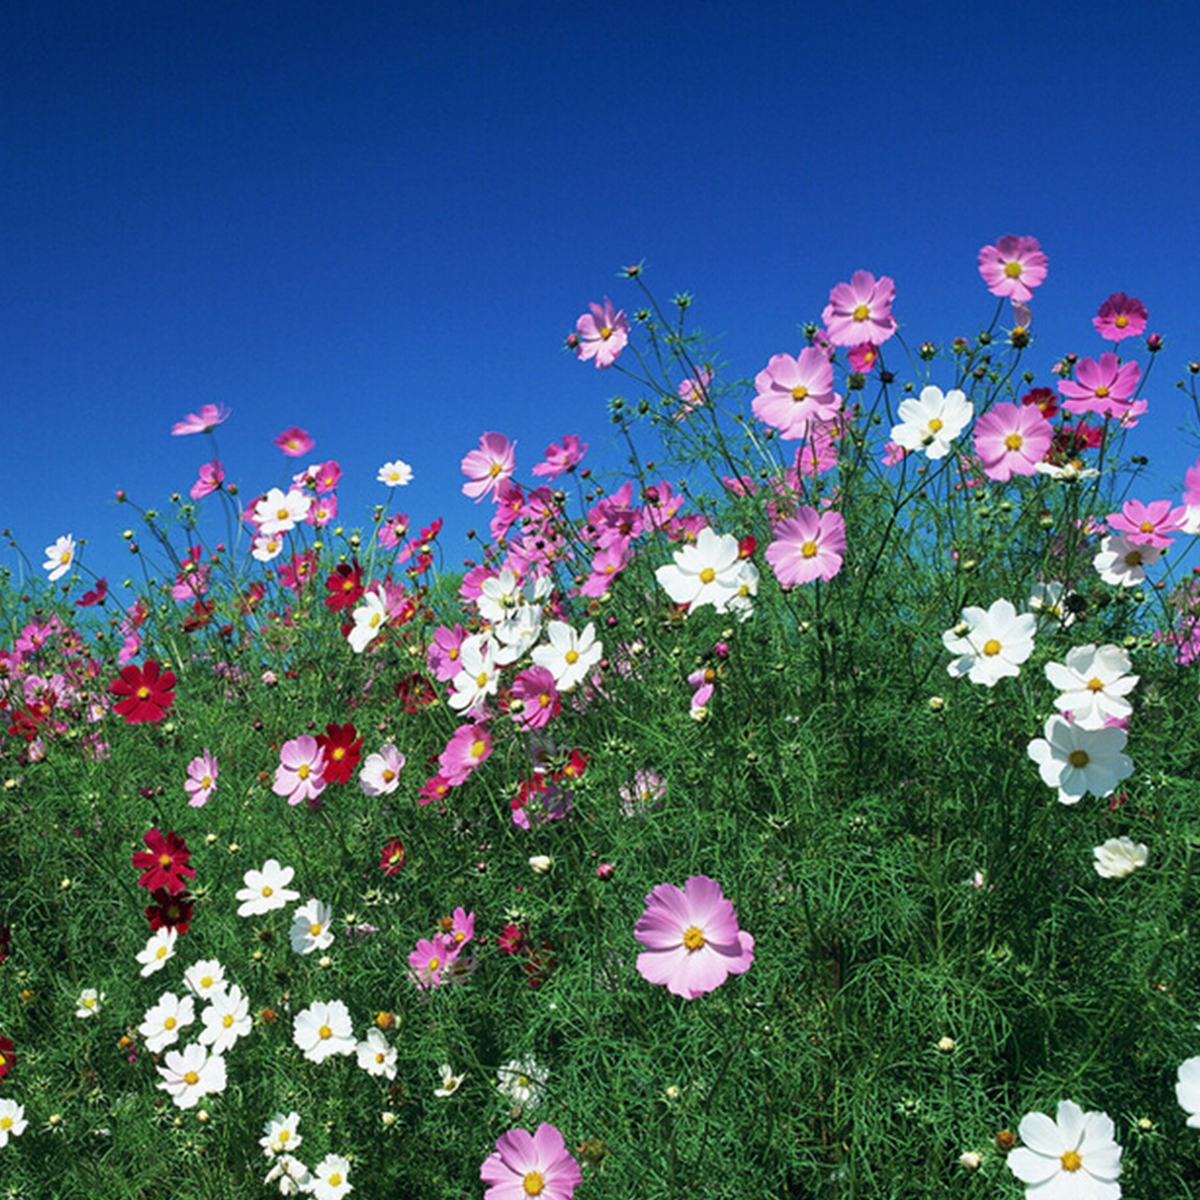 100 x cosmos bipinnatus perennial herbs garden park yard flower image is loading 100 x cosmos bipinnatus perennial herbs garden park izmirmasajfo Gallery